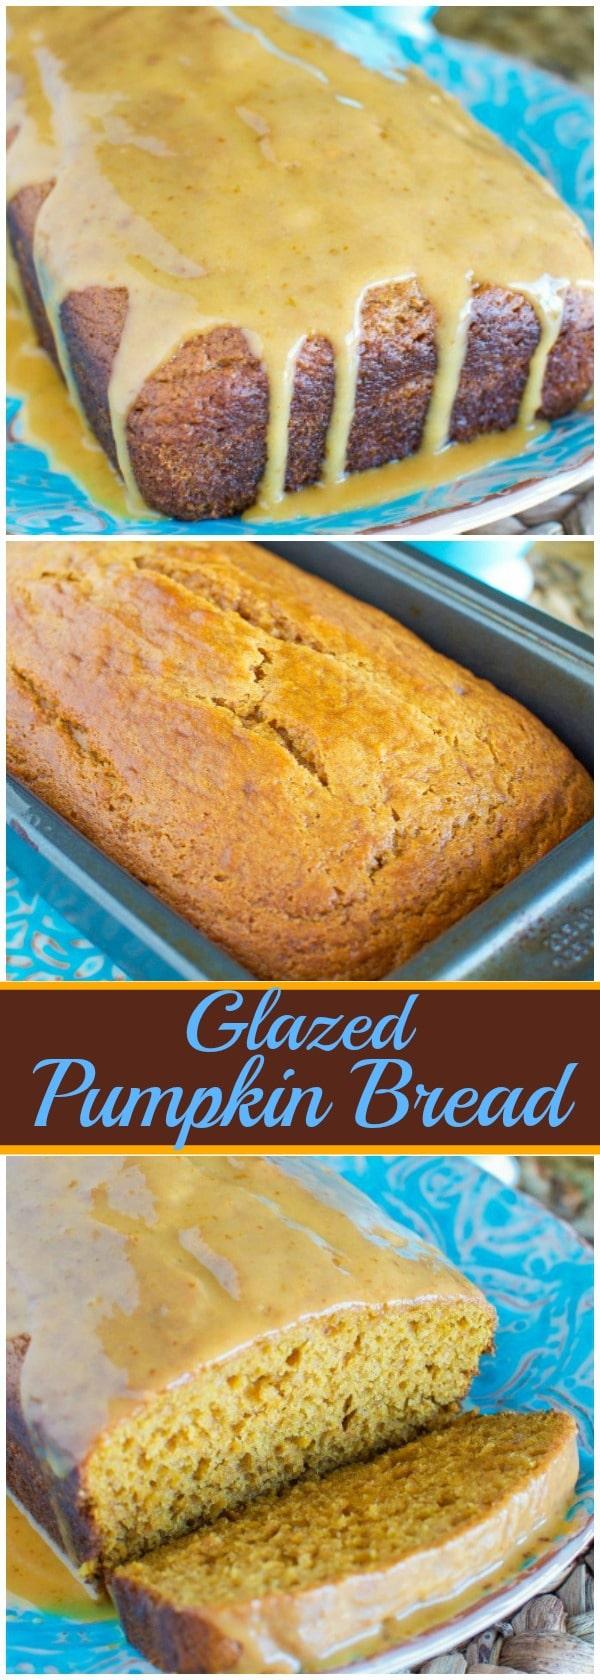 Glazed Pumpkin Bread - A MUST MAKE for fall!!